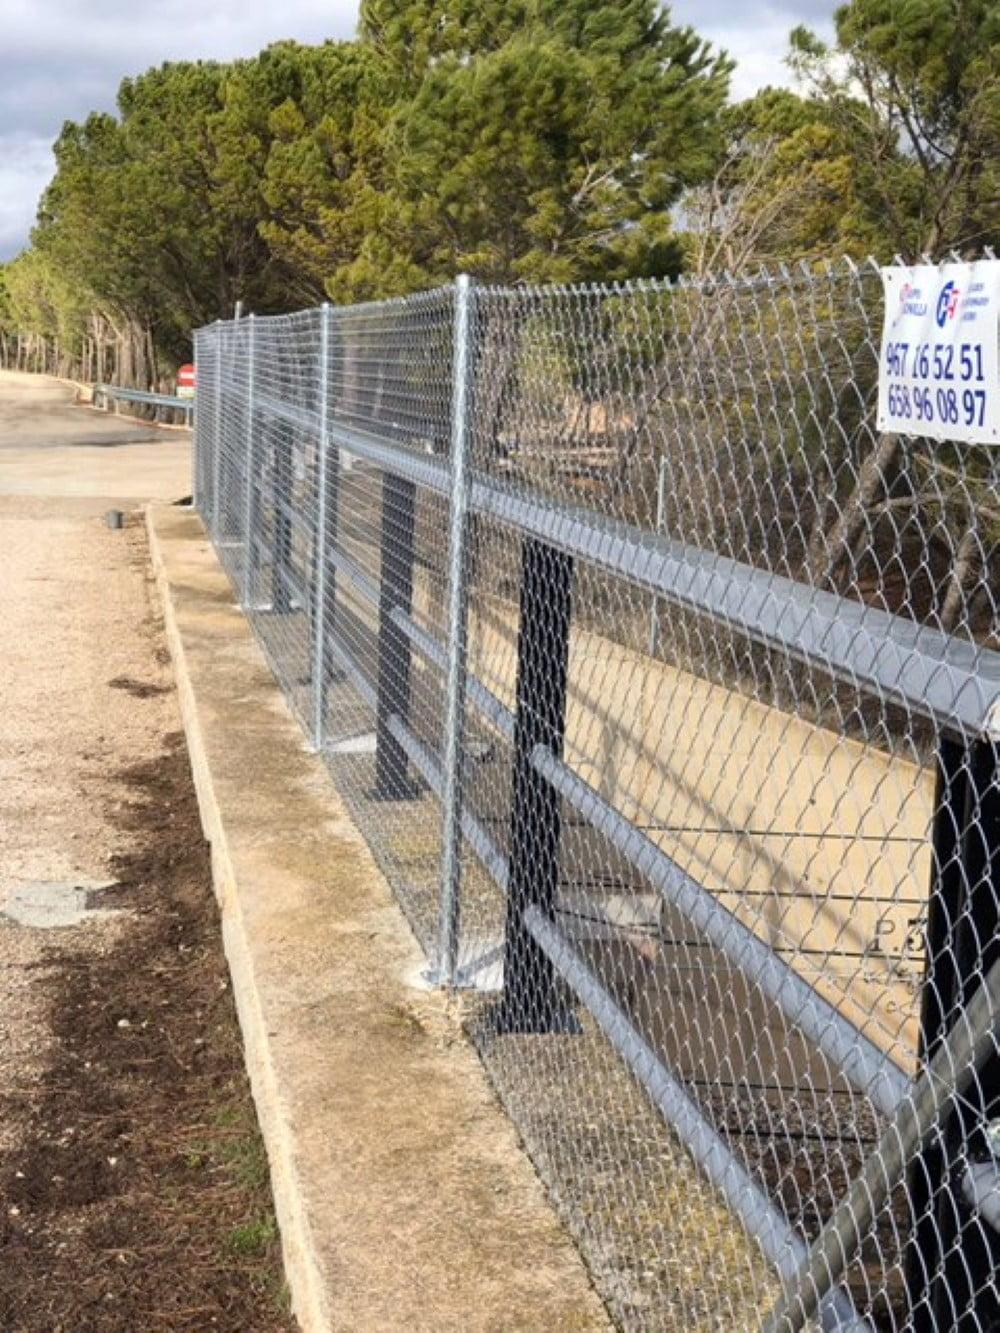 Cerramiento en Viaducto Tajo-Segura